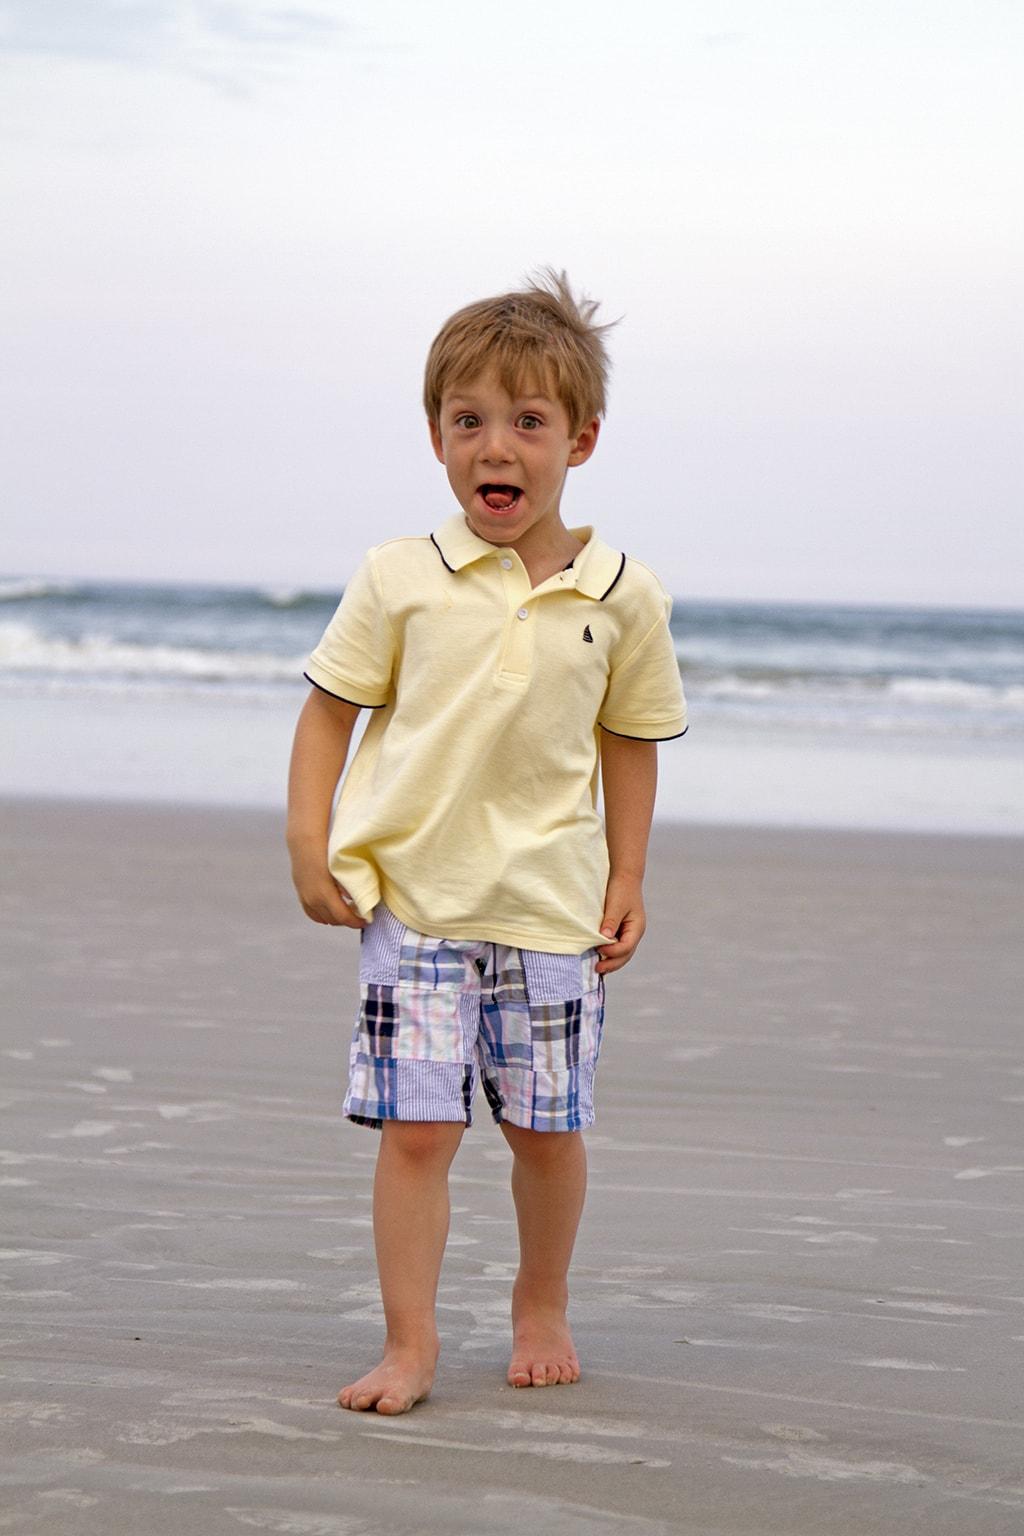 Kid Beach Photos